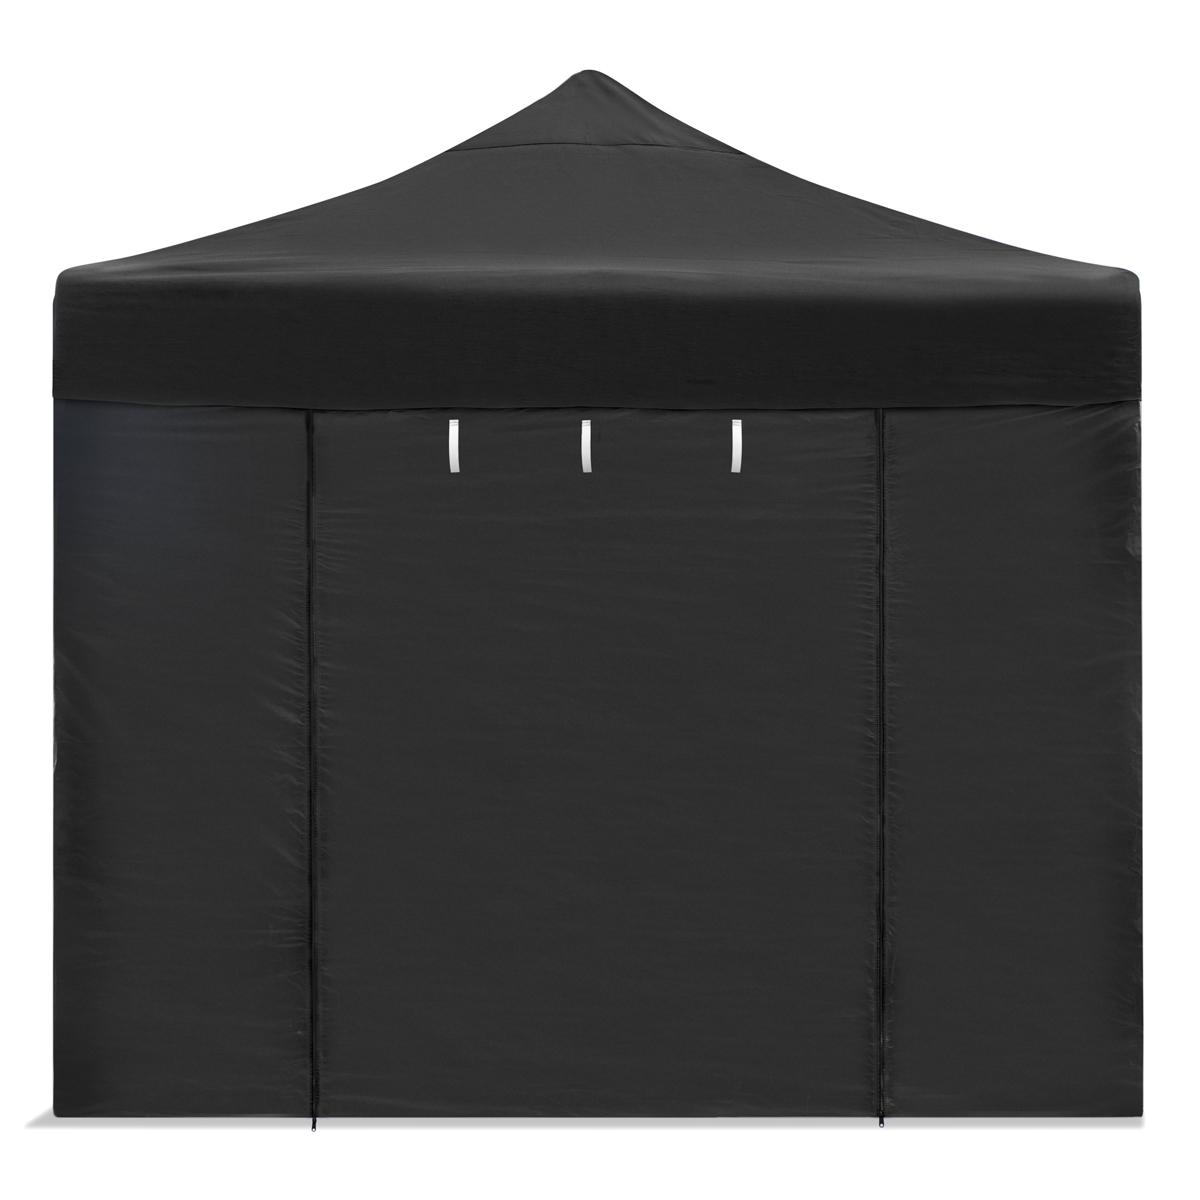 miniatura 18 - Carpa plegable 3x3 impermeable, carpas para exteriores, jardin o terraza